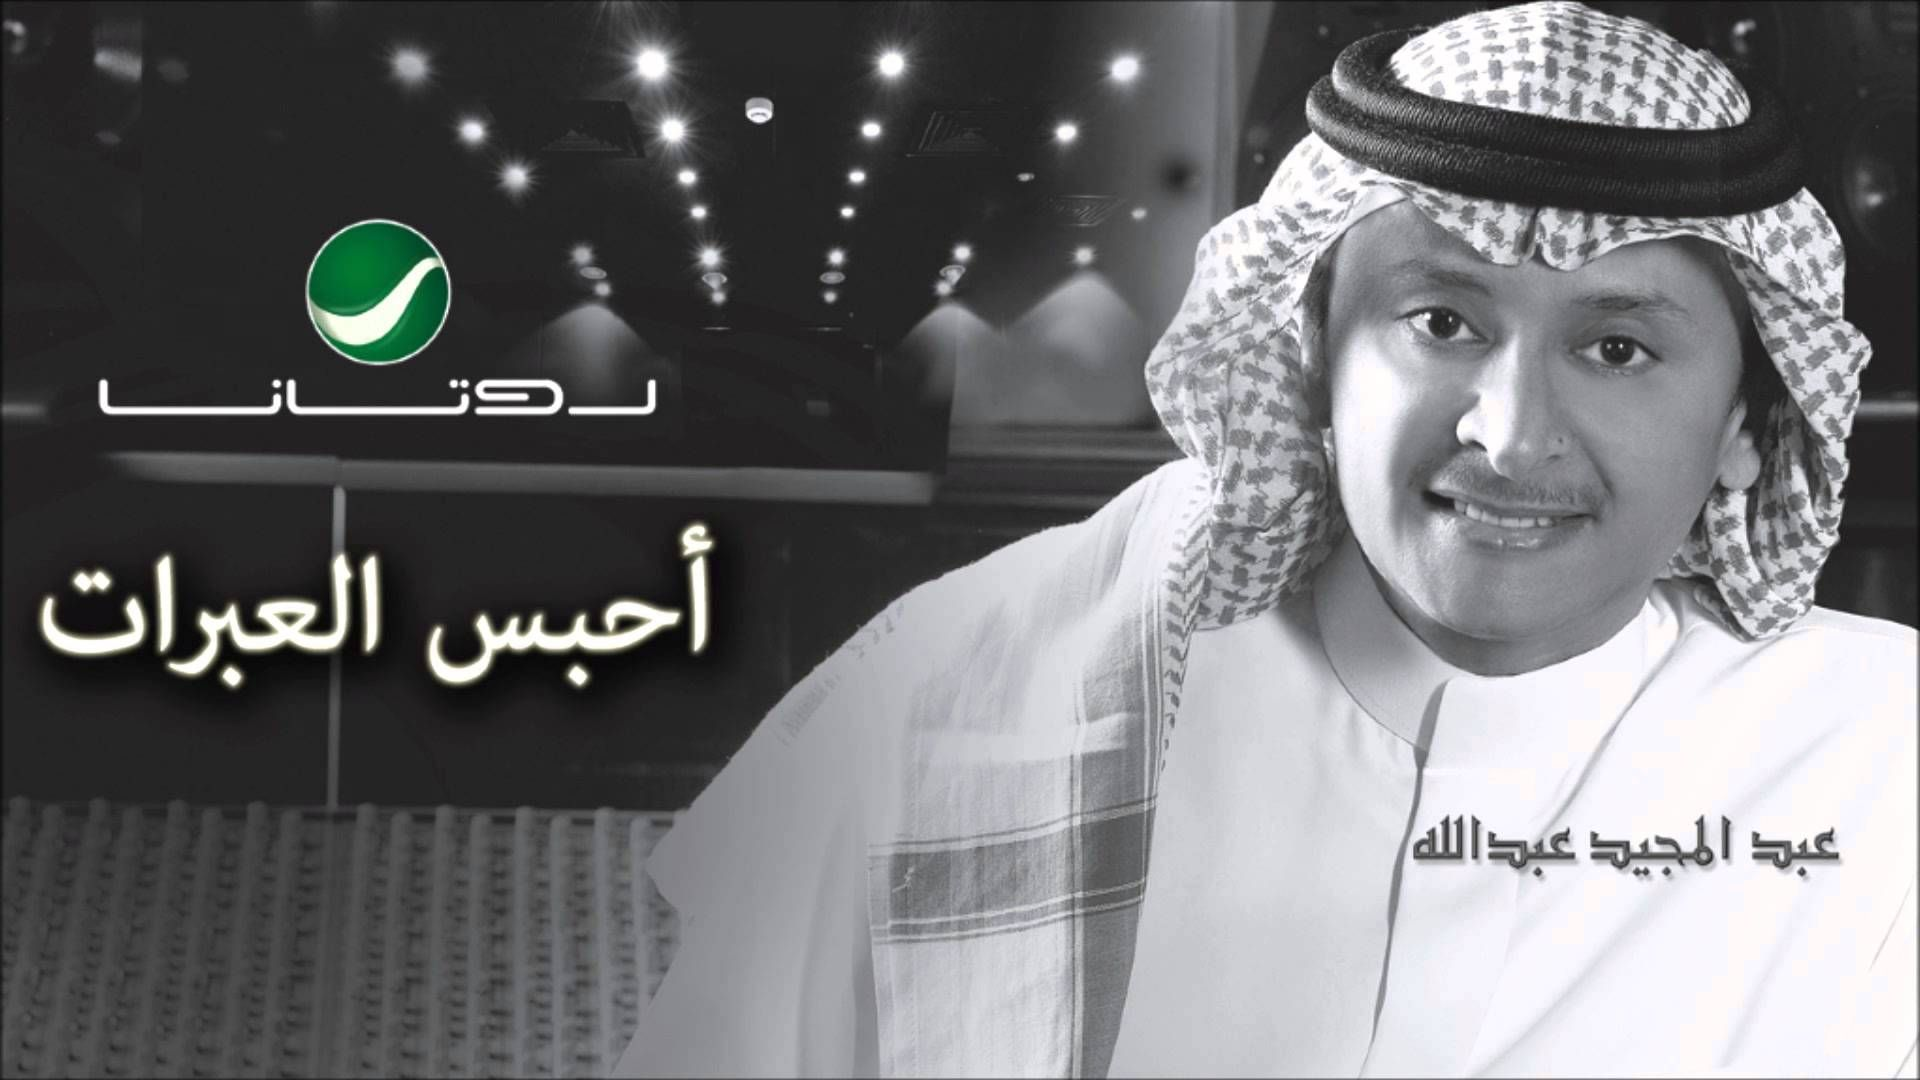 Abdul Majeed Abdullah Ahbes El Aabraat عبدالمجيد عبدالله إحبس العبرات Songs Music Youtube